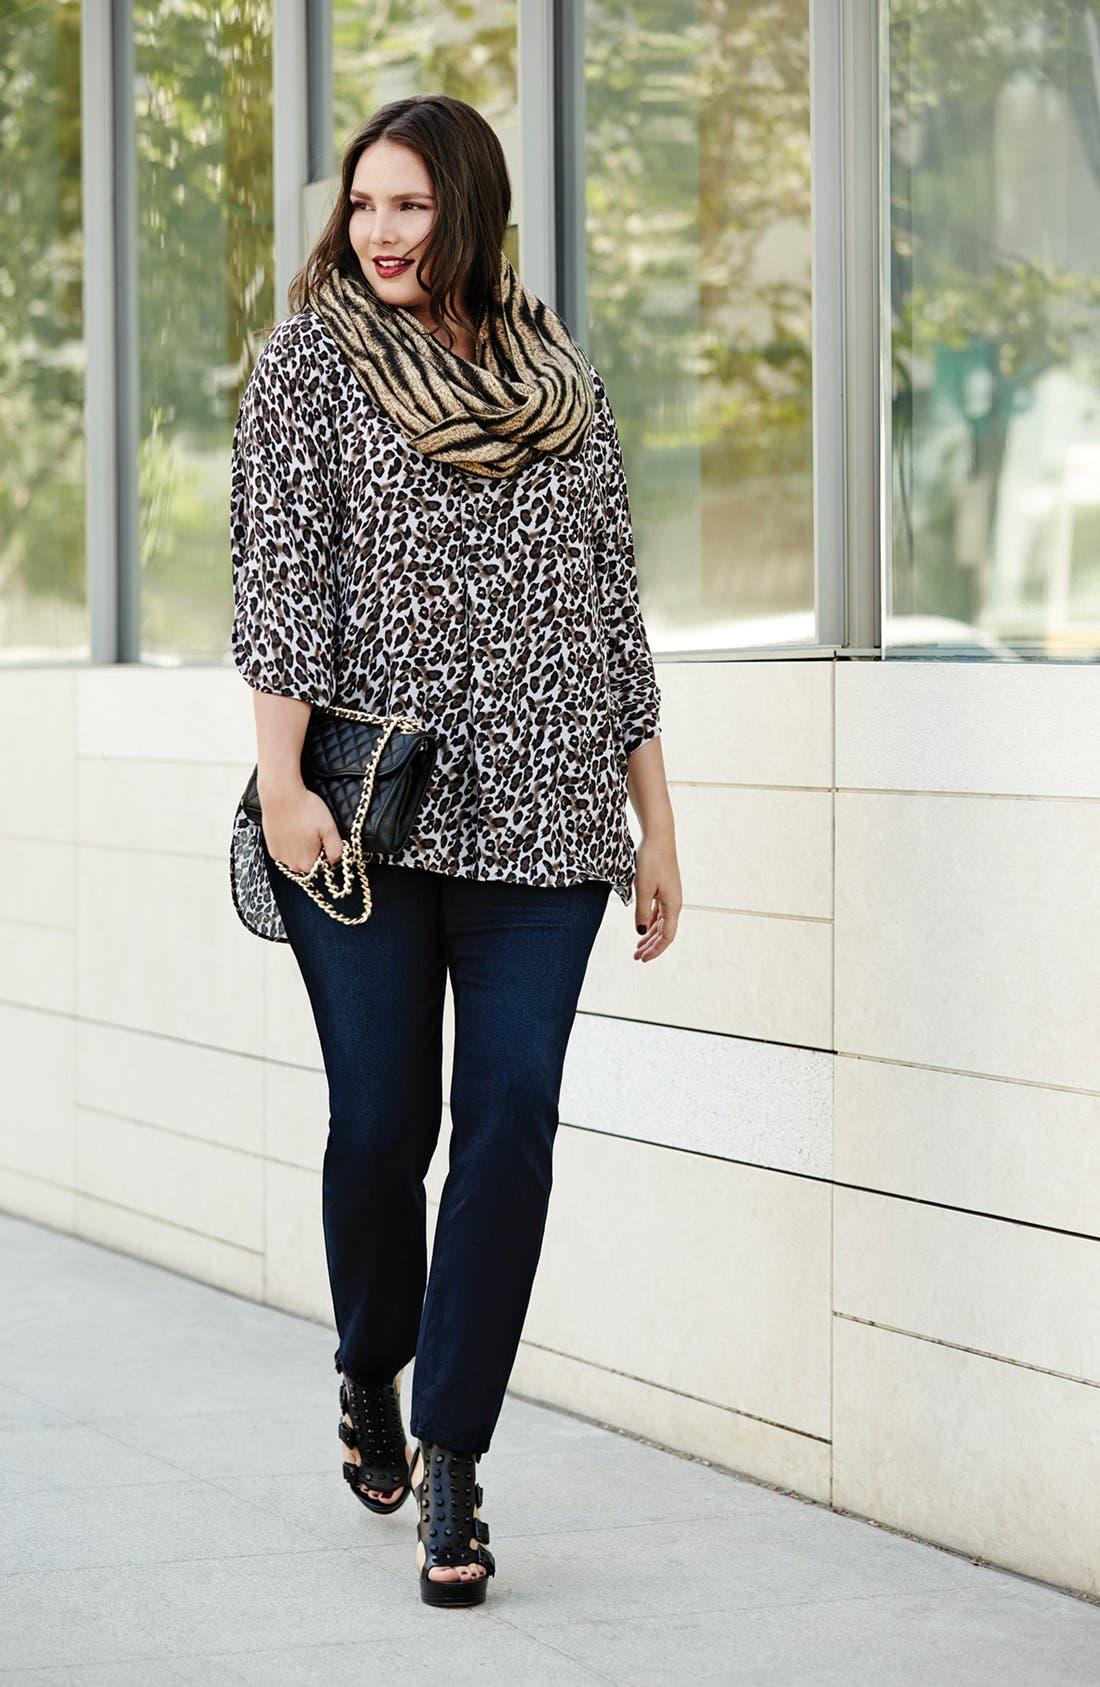 Main Image - Bellatrix Tunic Shirt & NYDJ Stretch Skinny Jeans (Plus Size)